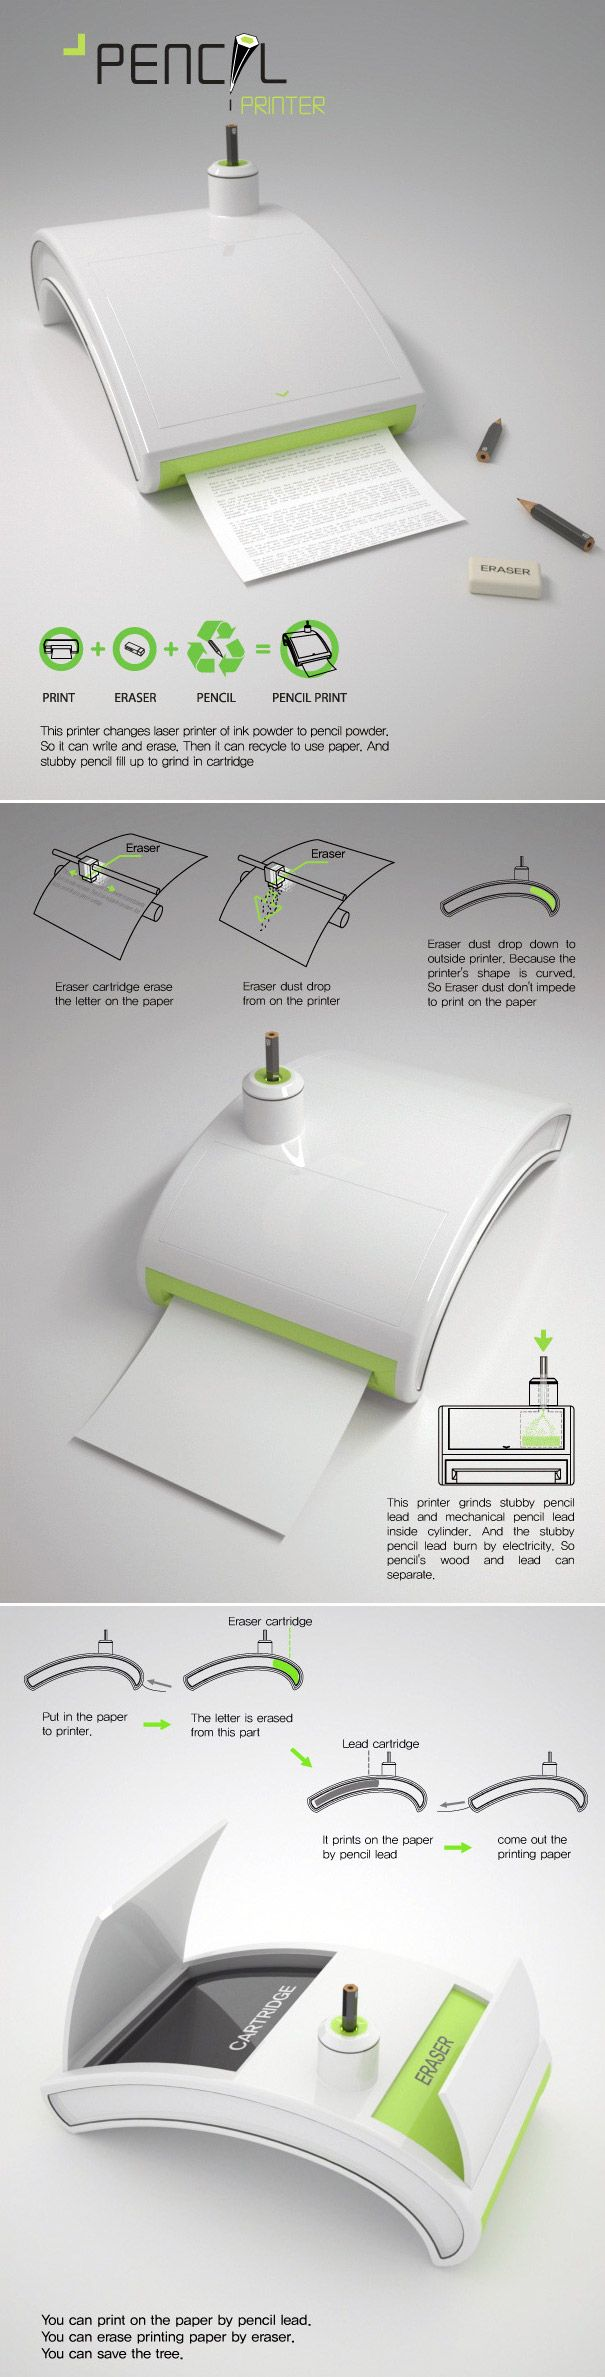 Pencil Printer